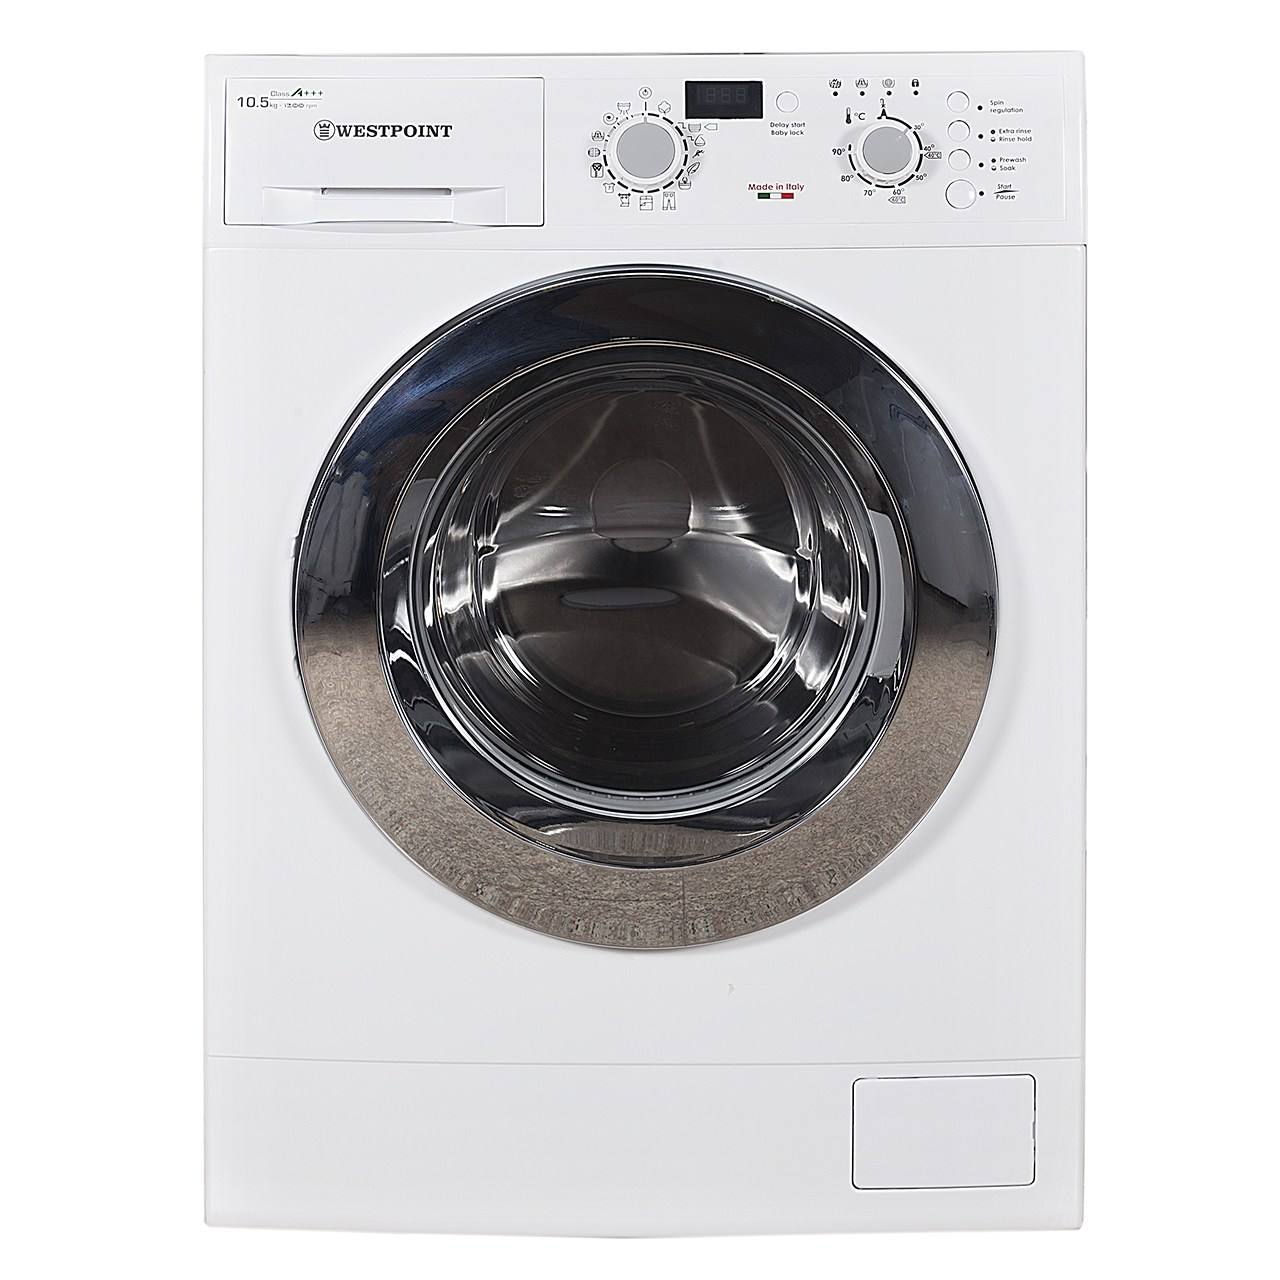 خرید                     ماشین لباسشویی وست پوینت مدل WMN101215ER ظرفیت 10.5 کیلوگرم